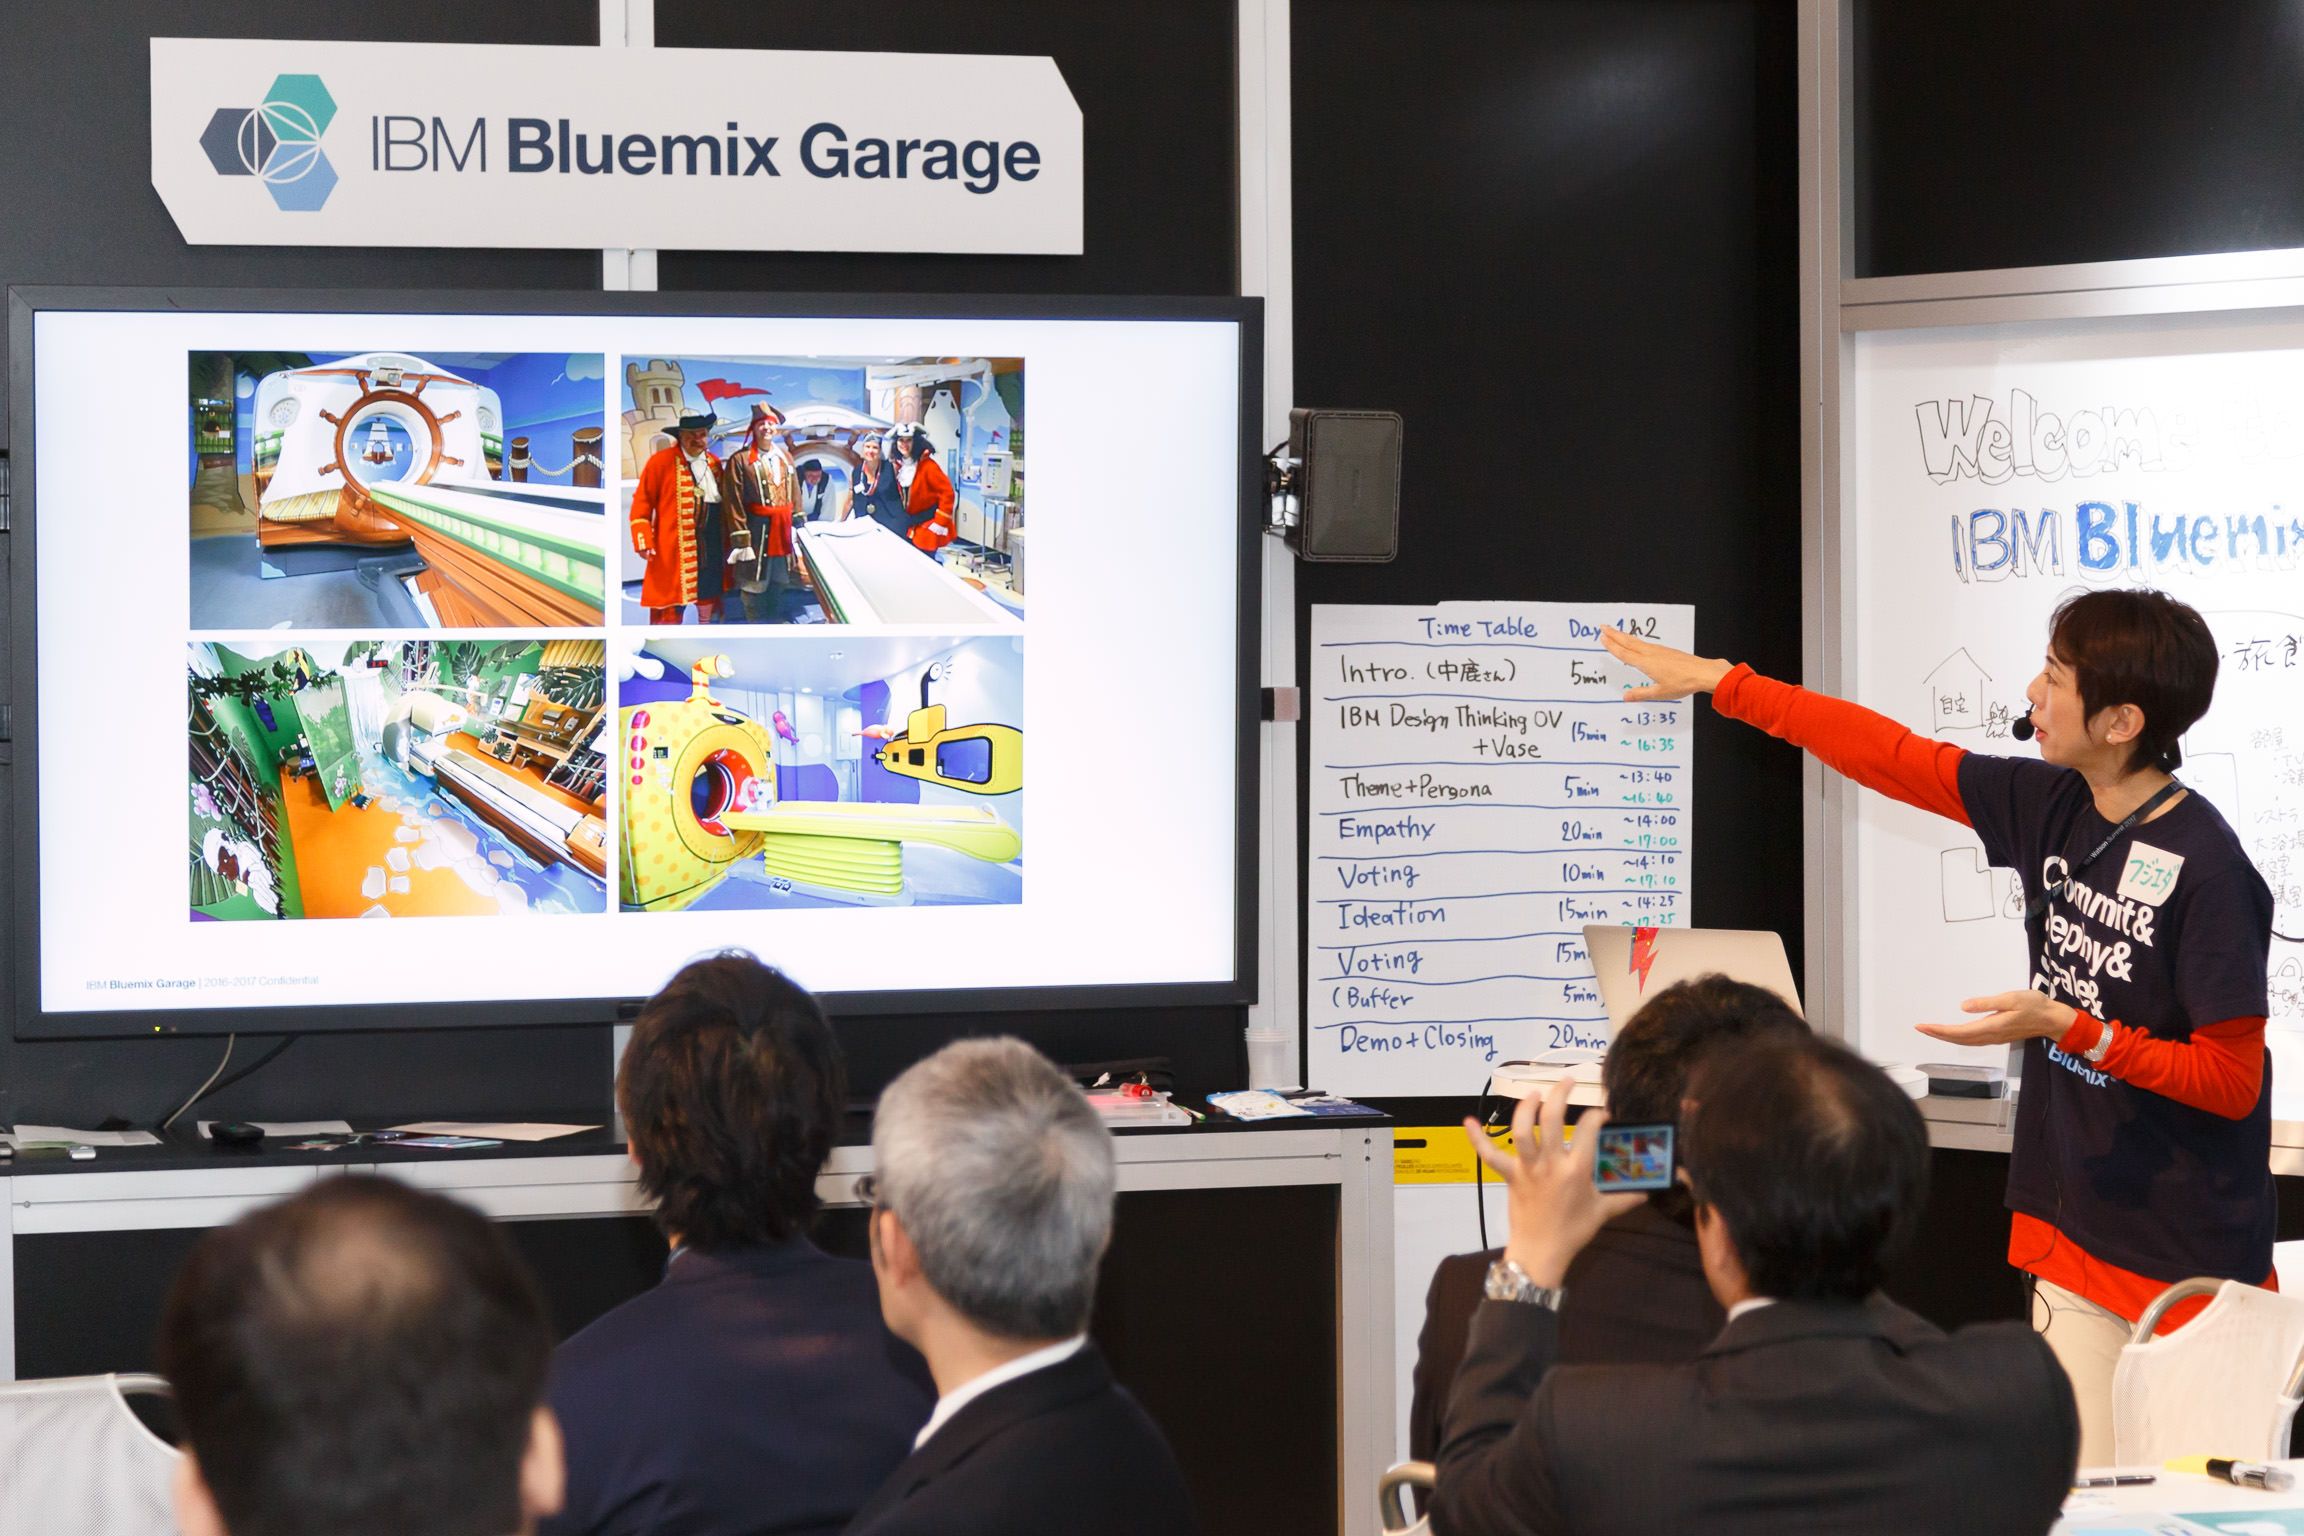 MRI 装置を「ごっこ遊び」の場にした事例を紹介するIBMのデザイナー藤枝久美子氏